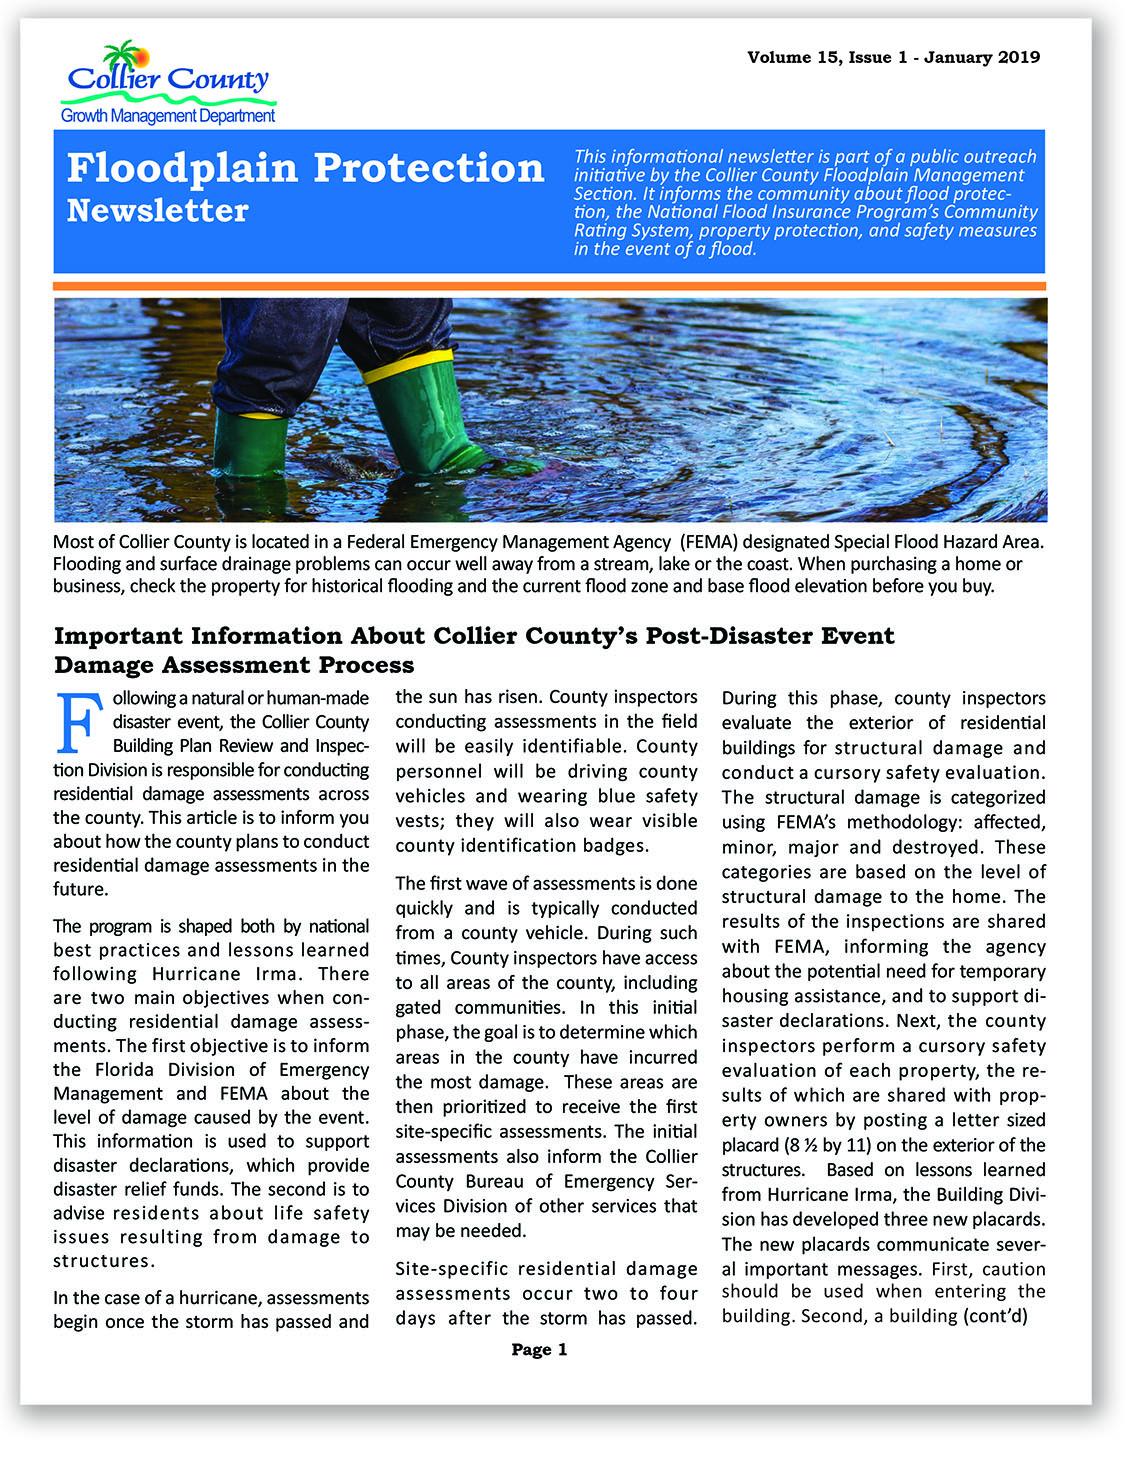 FLOODPLAIN NEWSLETTER JAN 30 FINAL-1